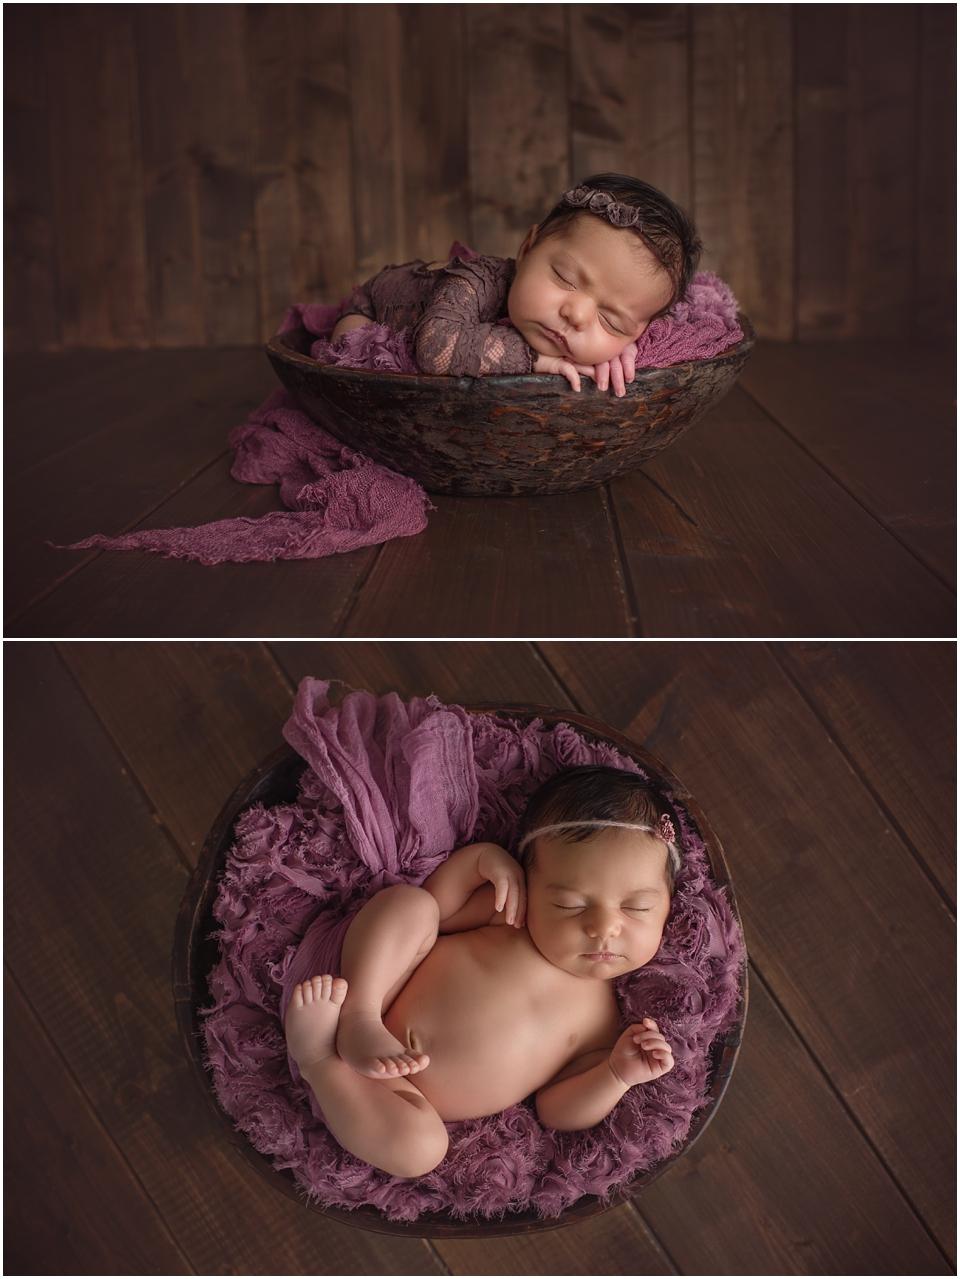 3_Babyfotograf_Moenchengladbach_Babyfotos_Duesseldorf_Hebamme_Geburtshaus_Baby_FotoShooting_Koeln